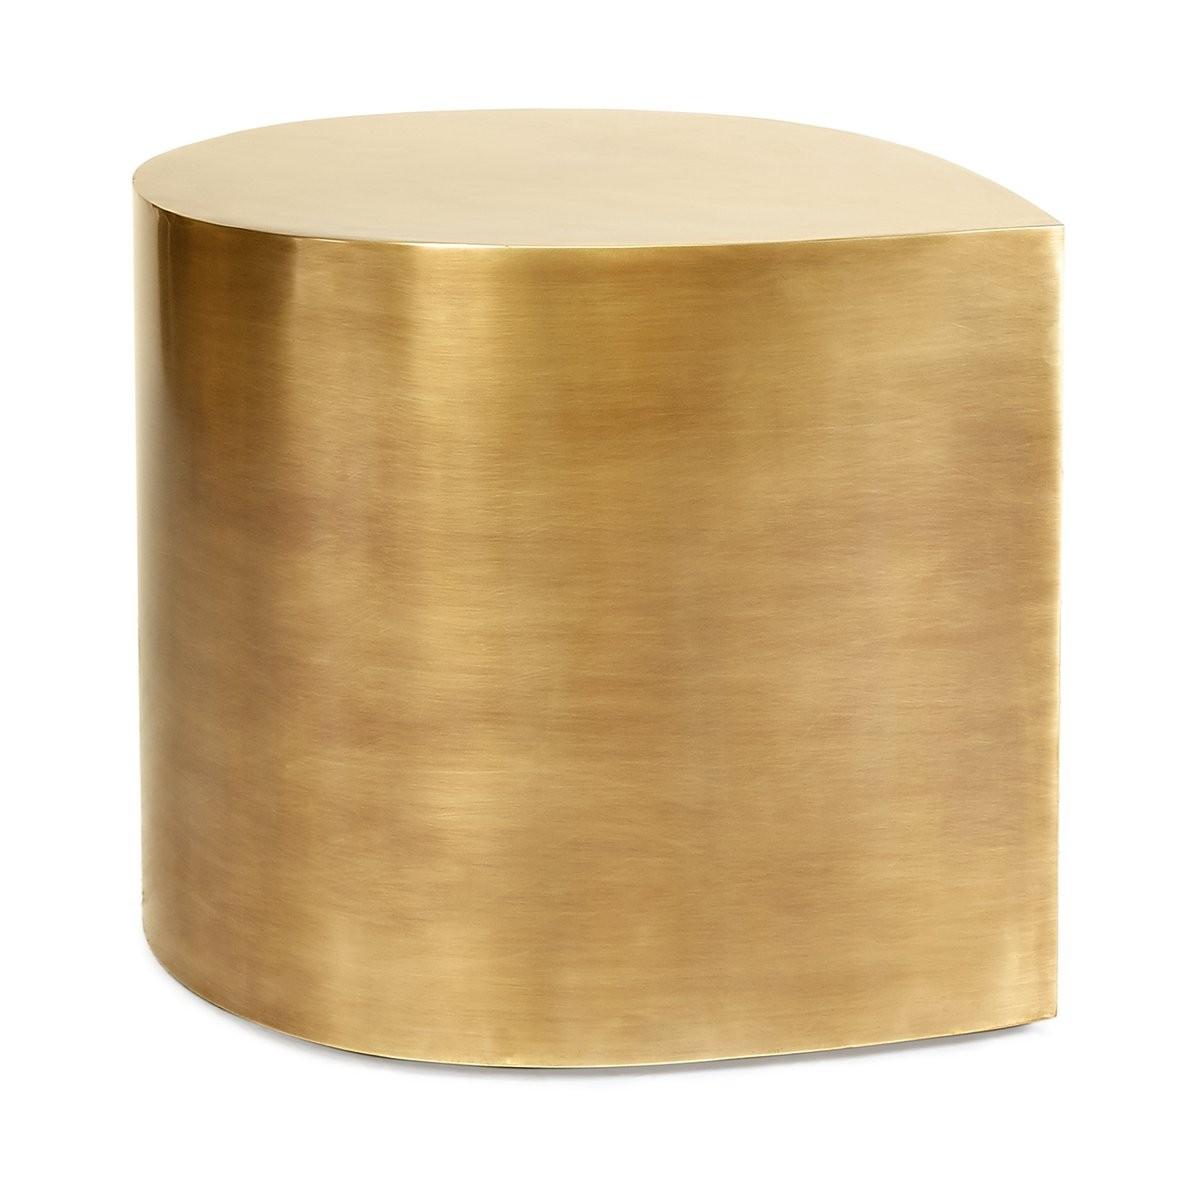 Jonathan Adler I Brass Teardrop Table